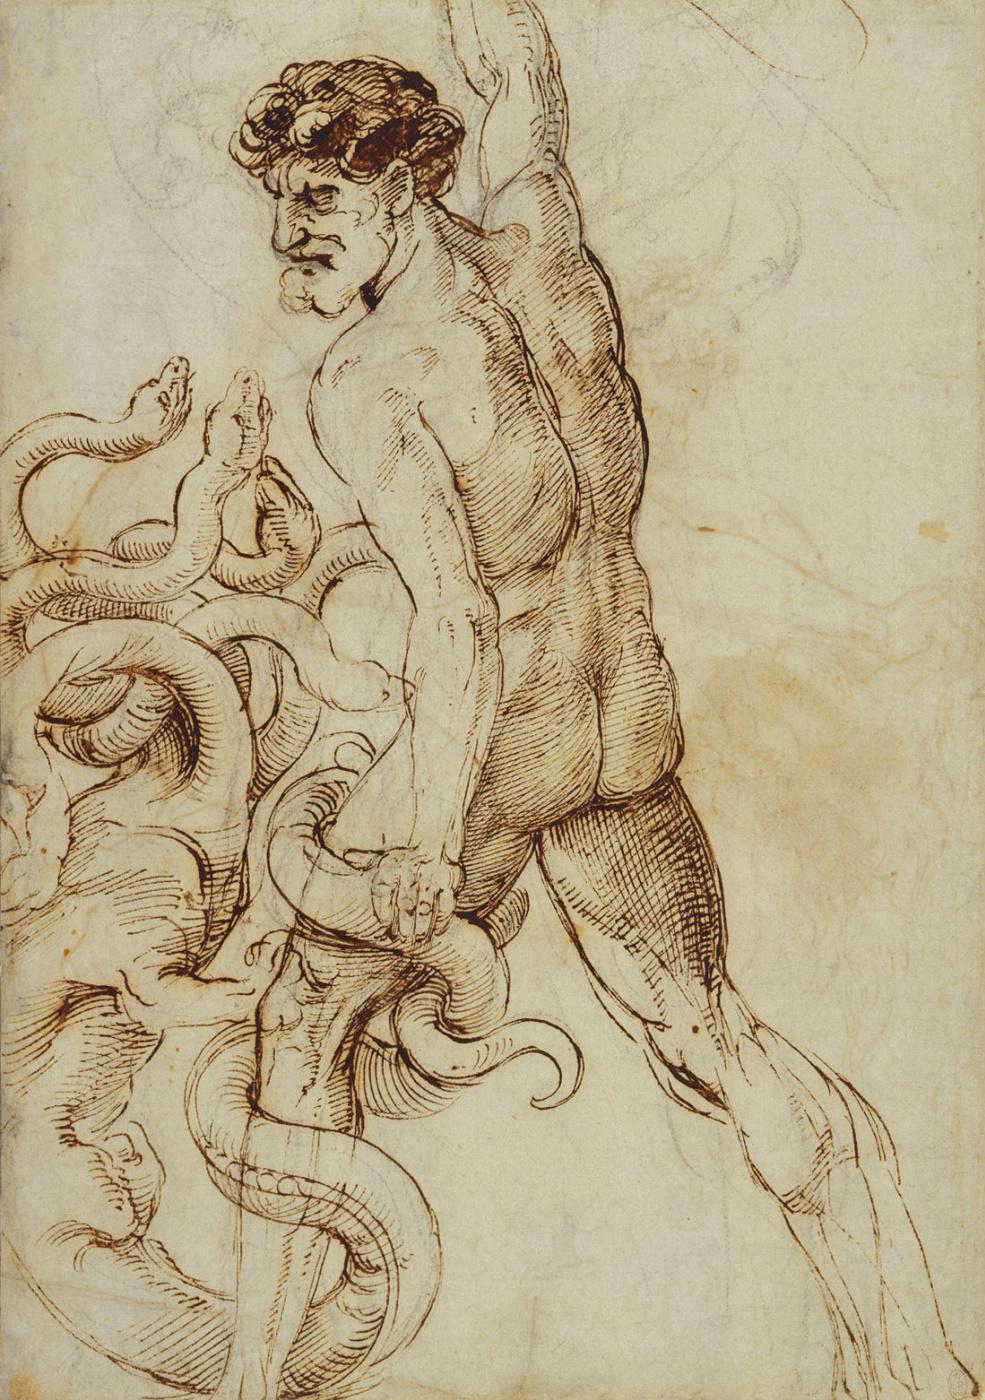 Raphael Sanzio. Hercules and the Lernaean Hydra